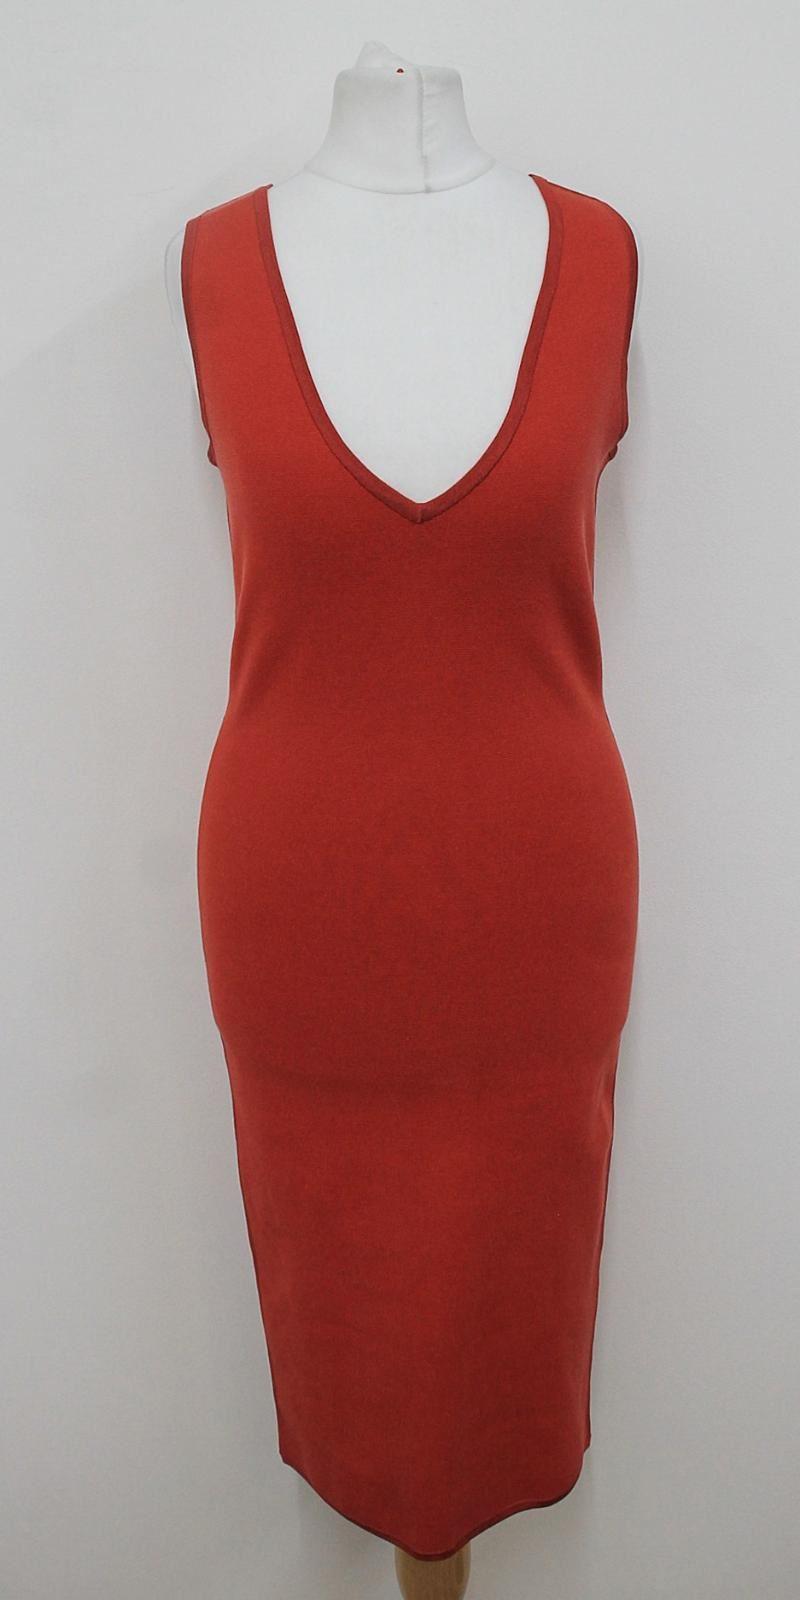 NICOLE-FARHI-Ladies-Red-Sleeveless-V-Neckline-Stretchy-Bodycon-Dress-Size-S